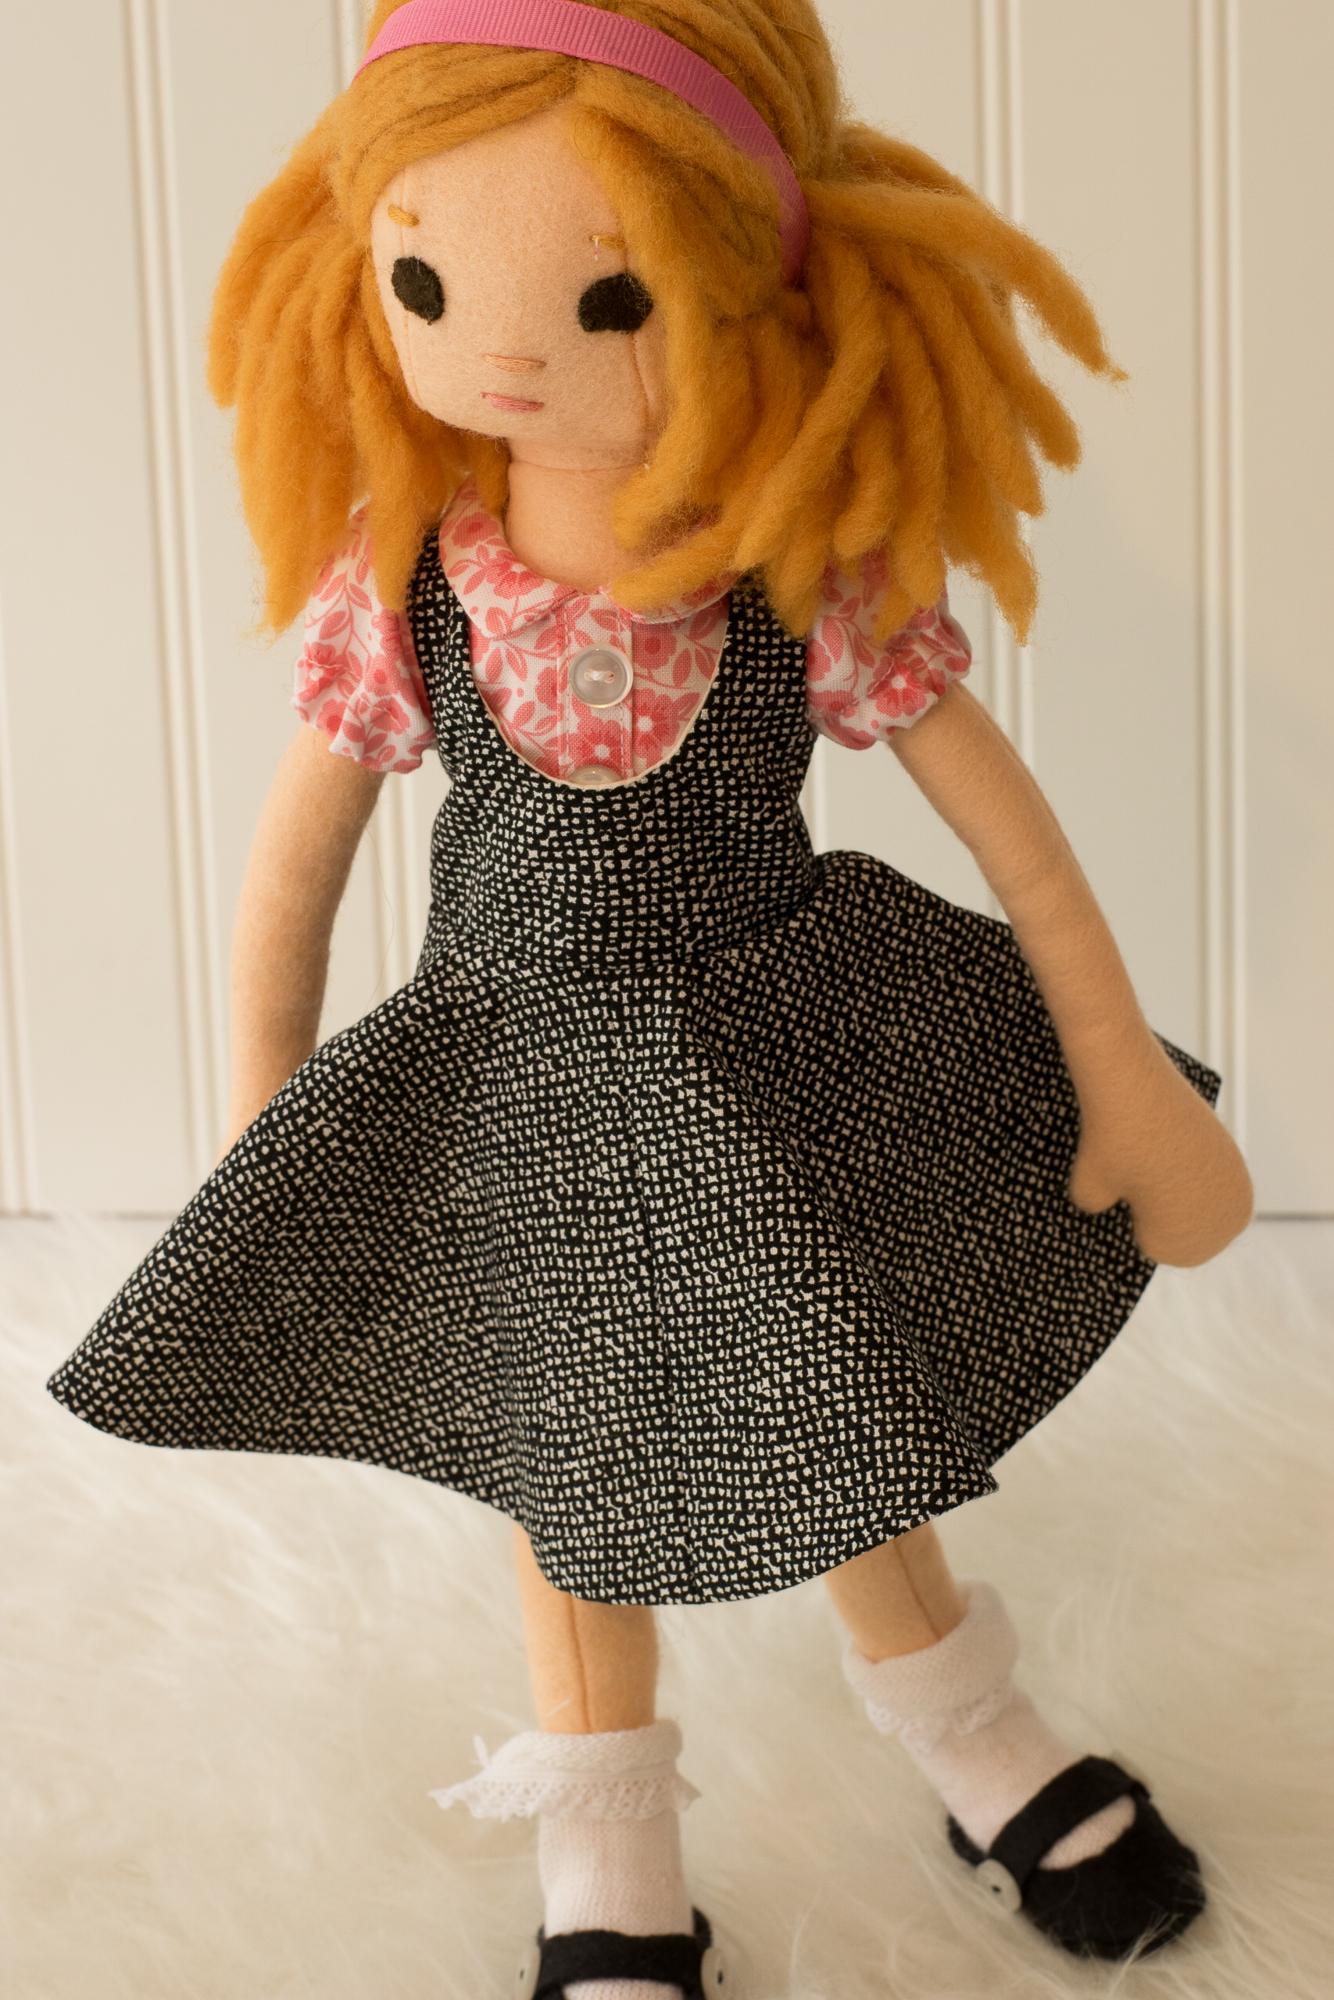 Gallery of Dolls-19.jpg